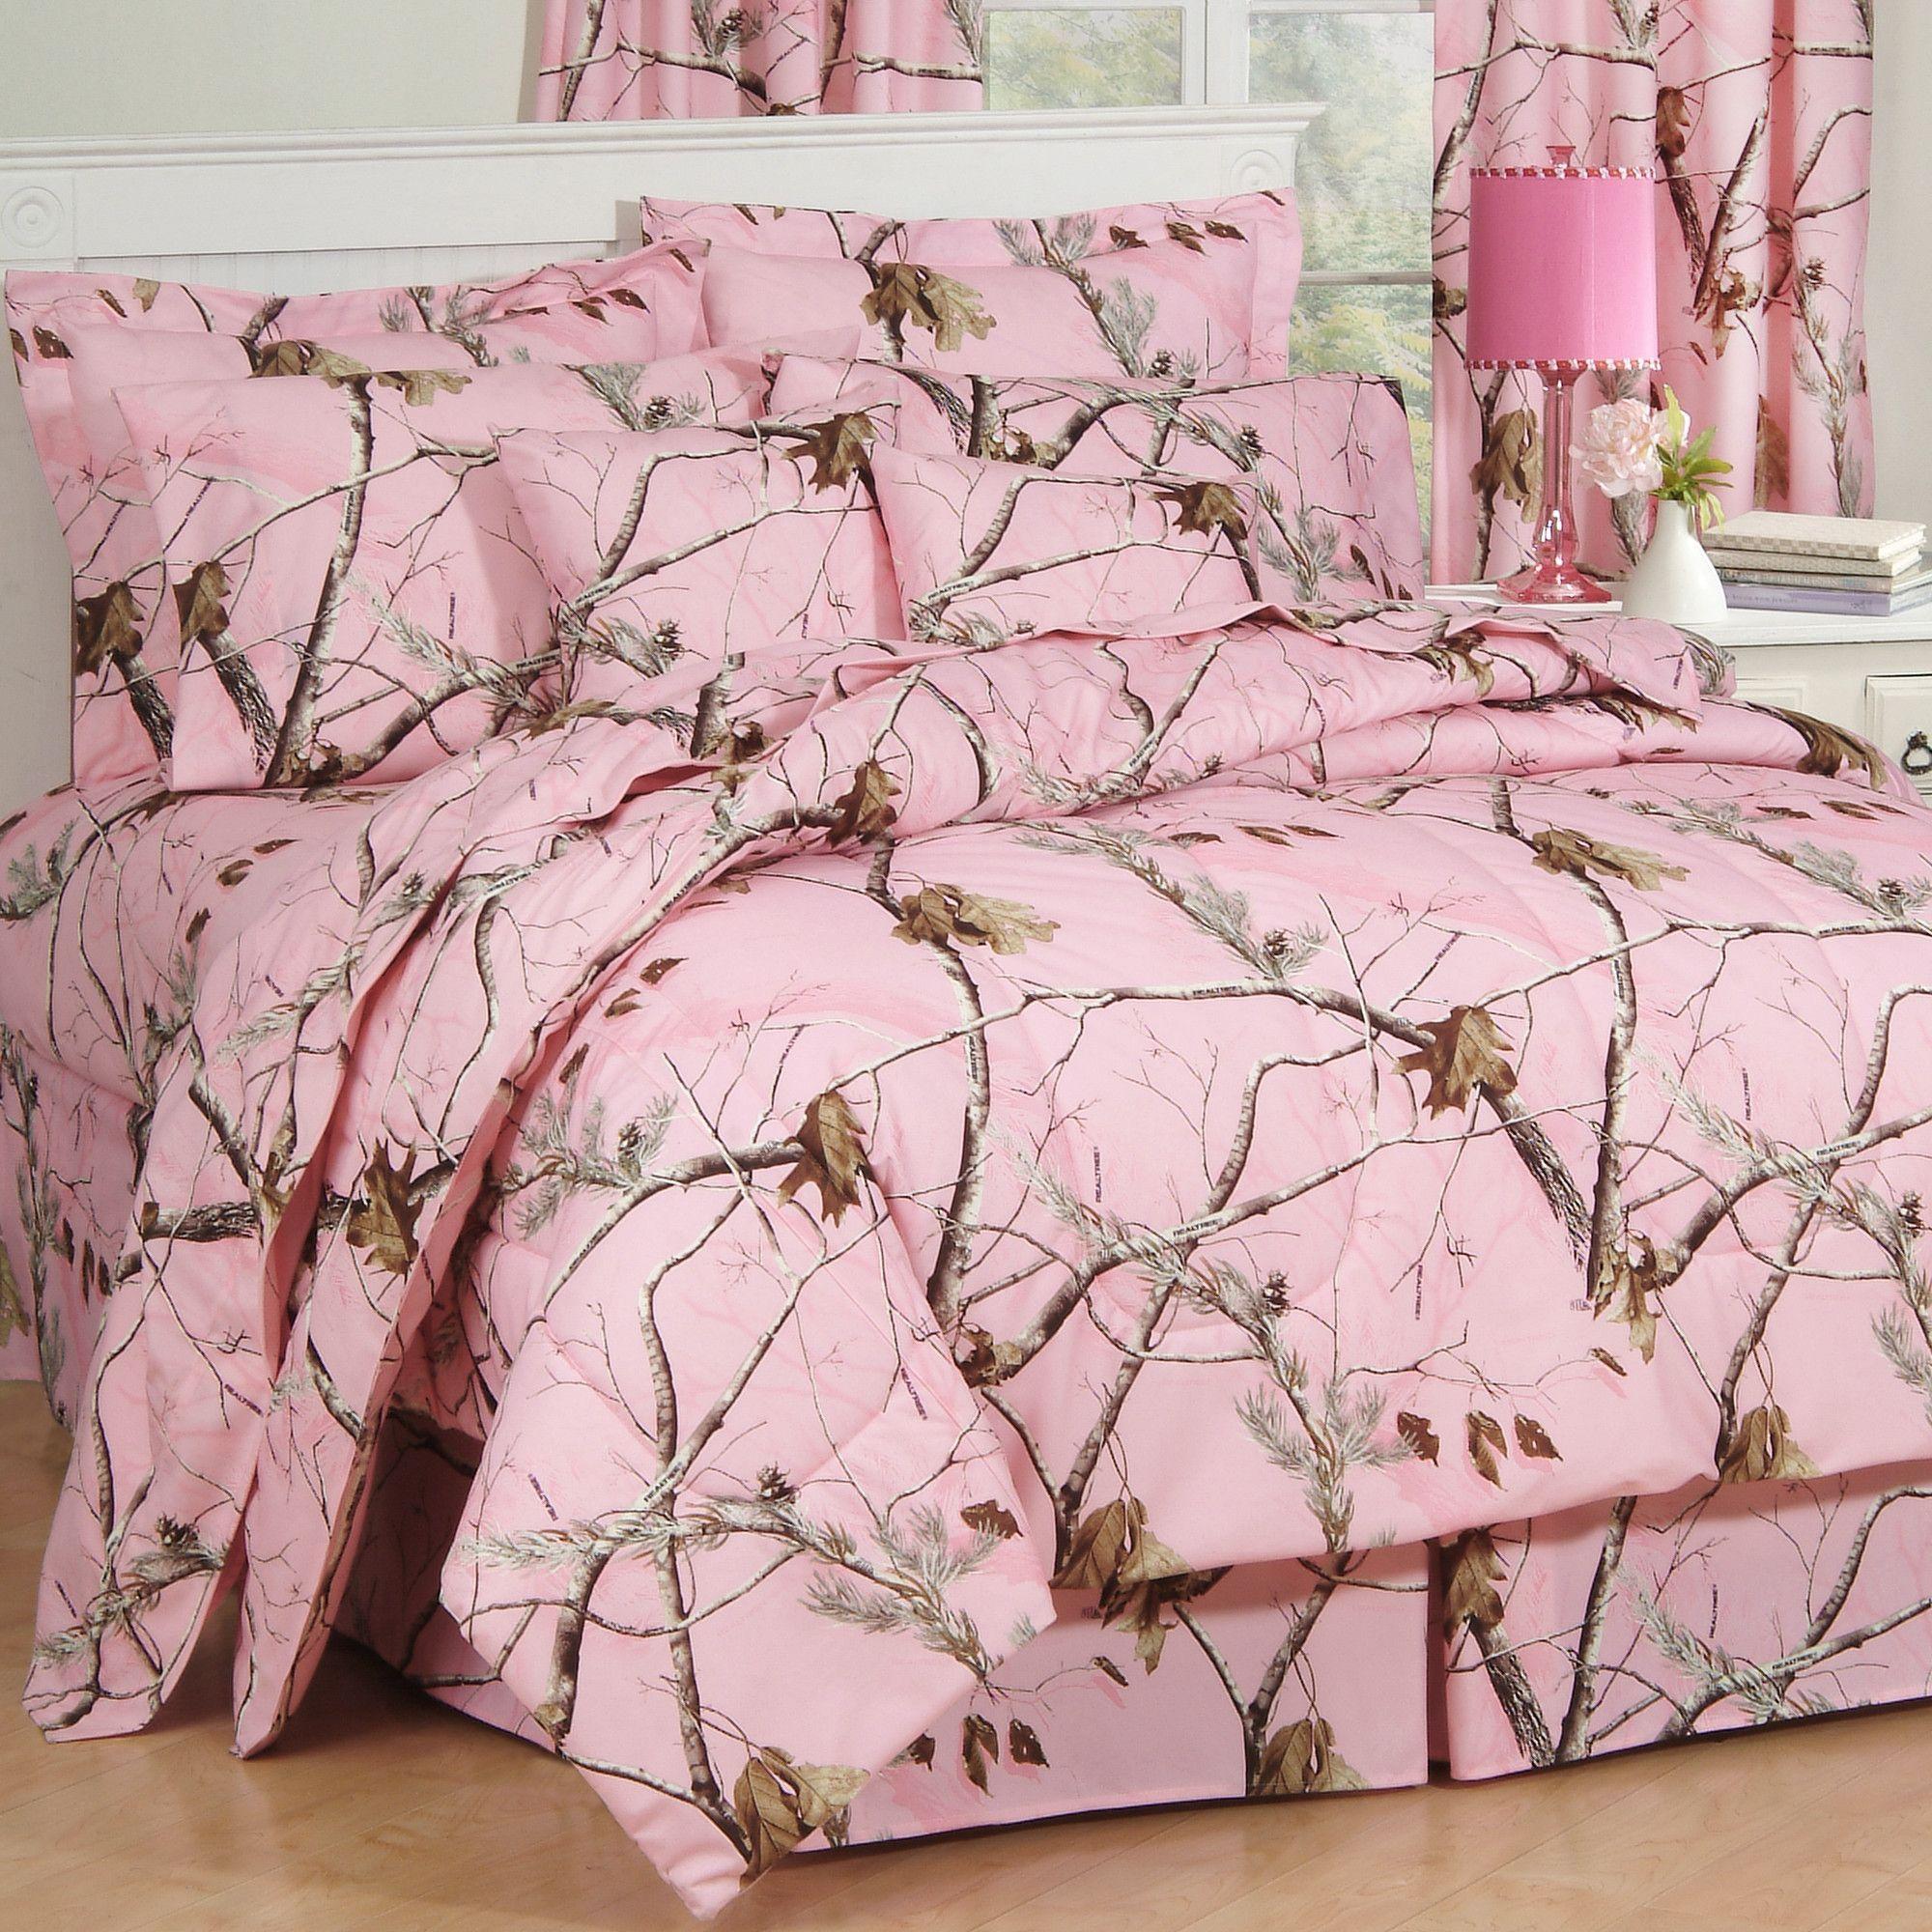 Incroyable Camo Comforter Set In Pink